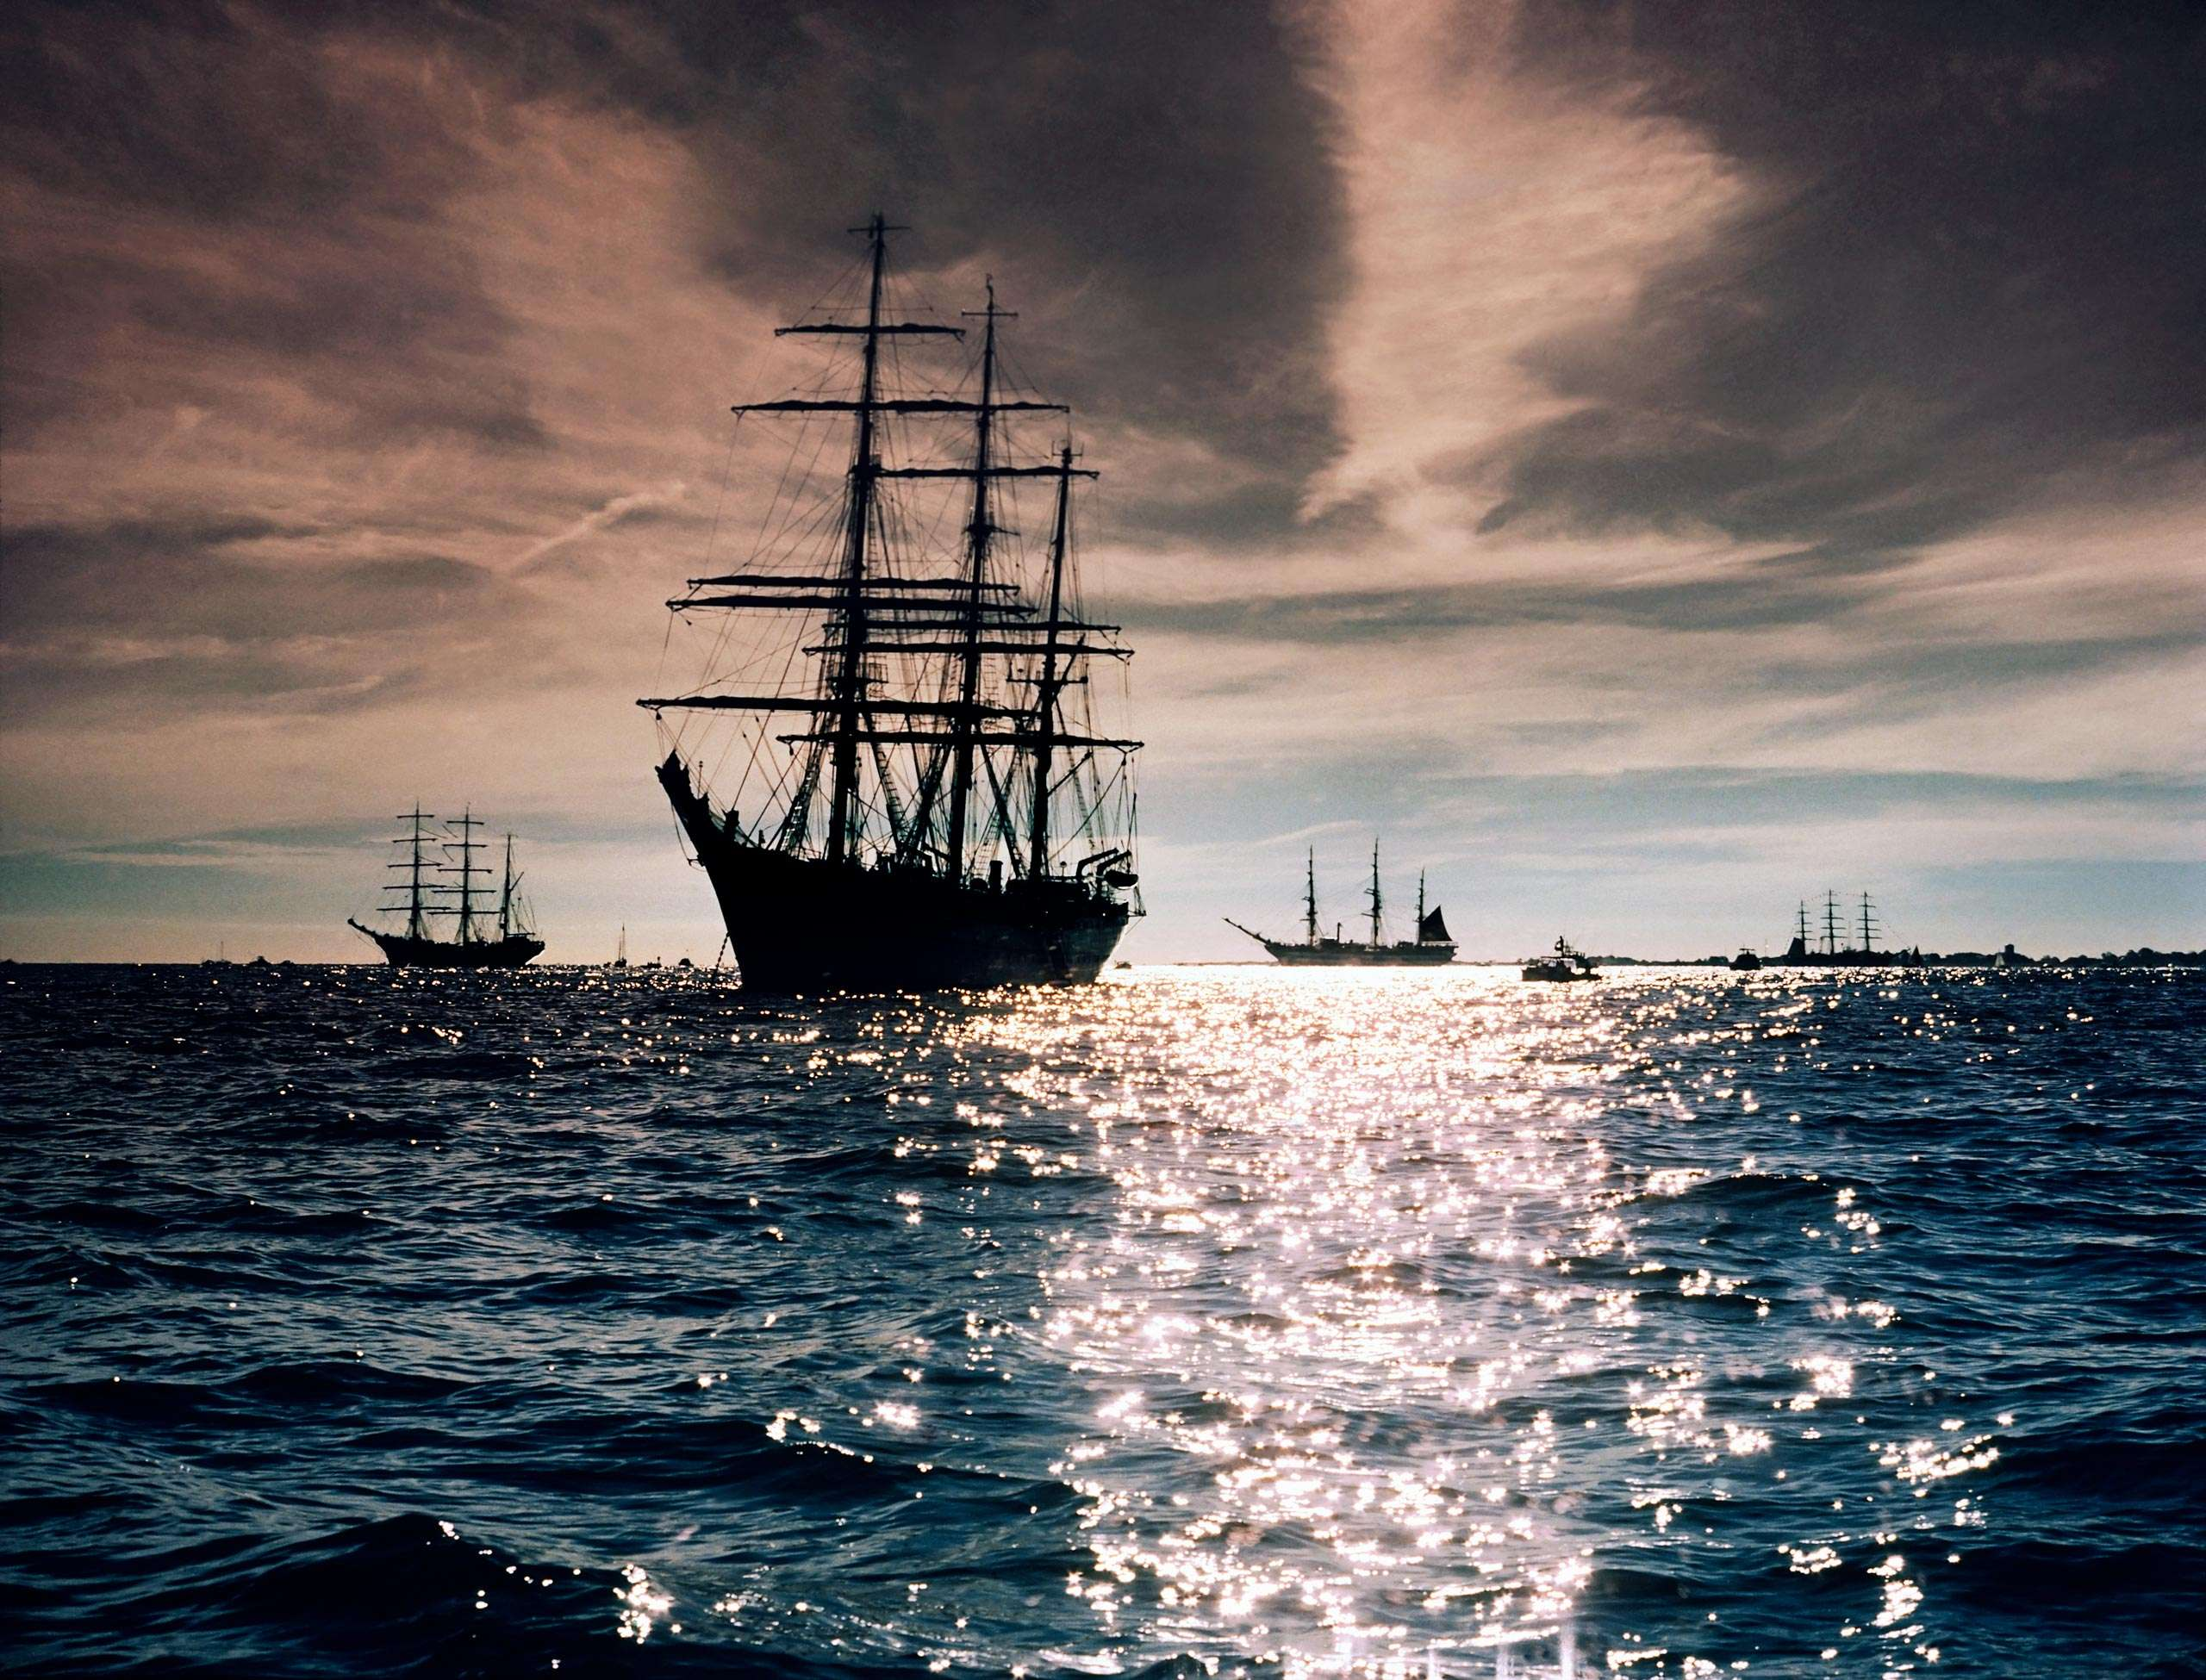 PORTFOLIO - Sailing - Tall Ships #17-PCG259